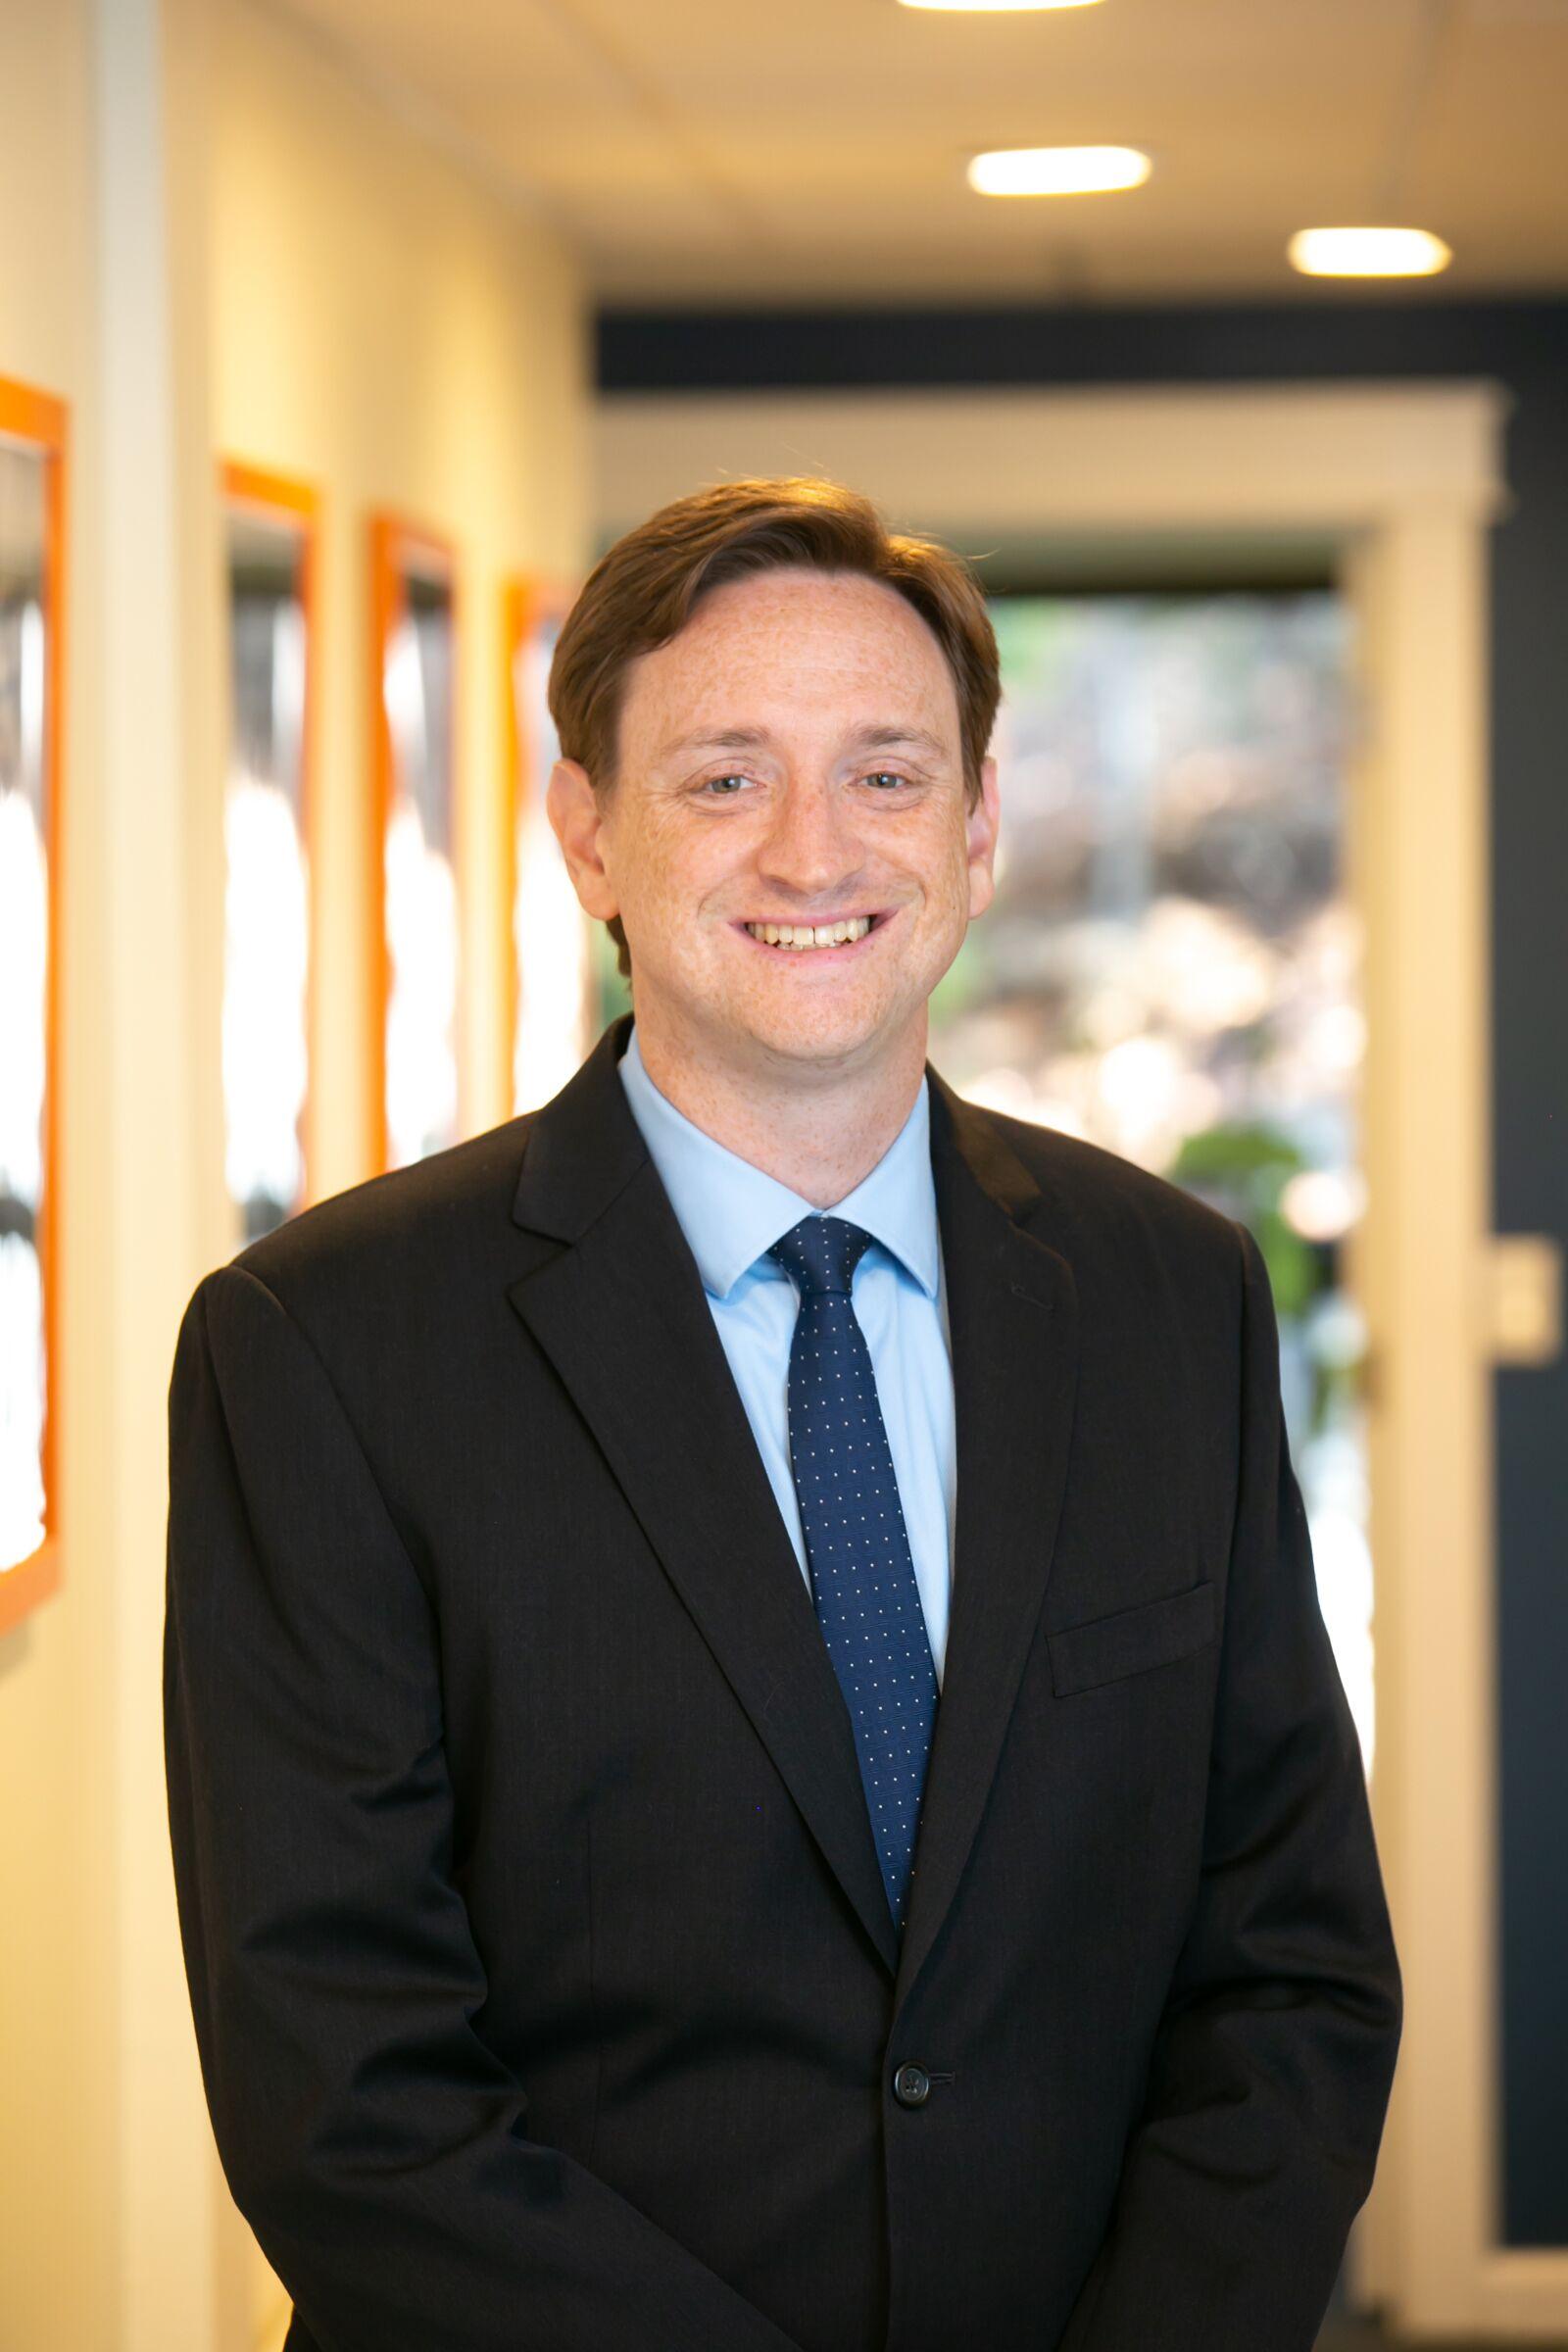 Jonathan Spector